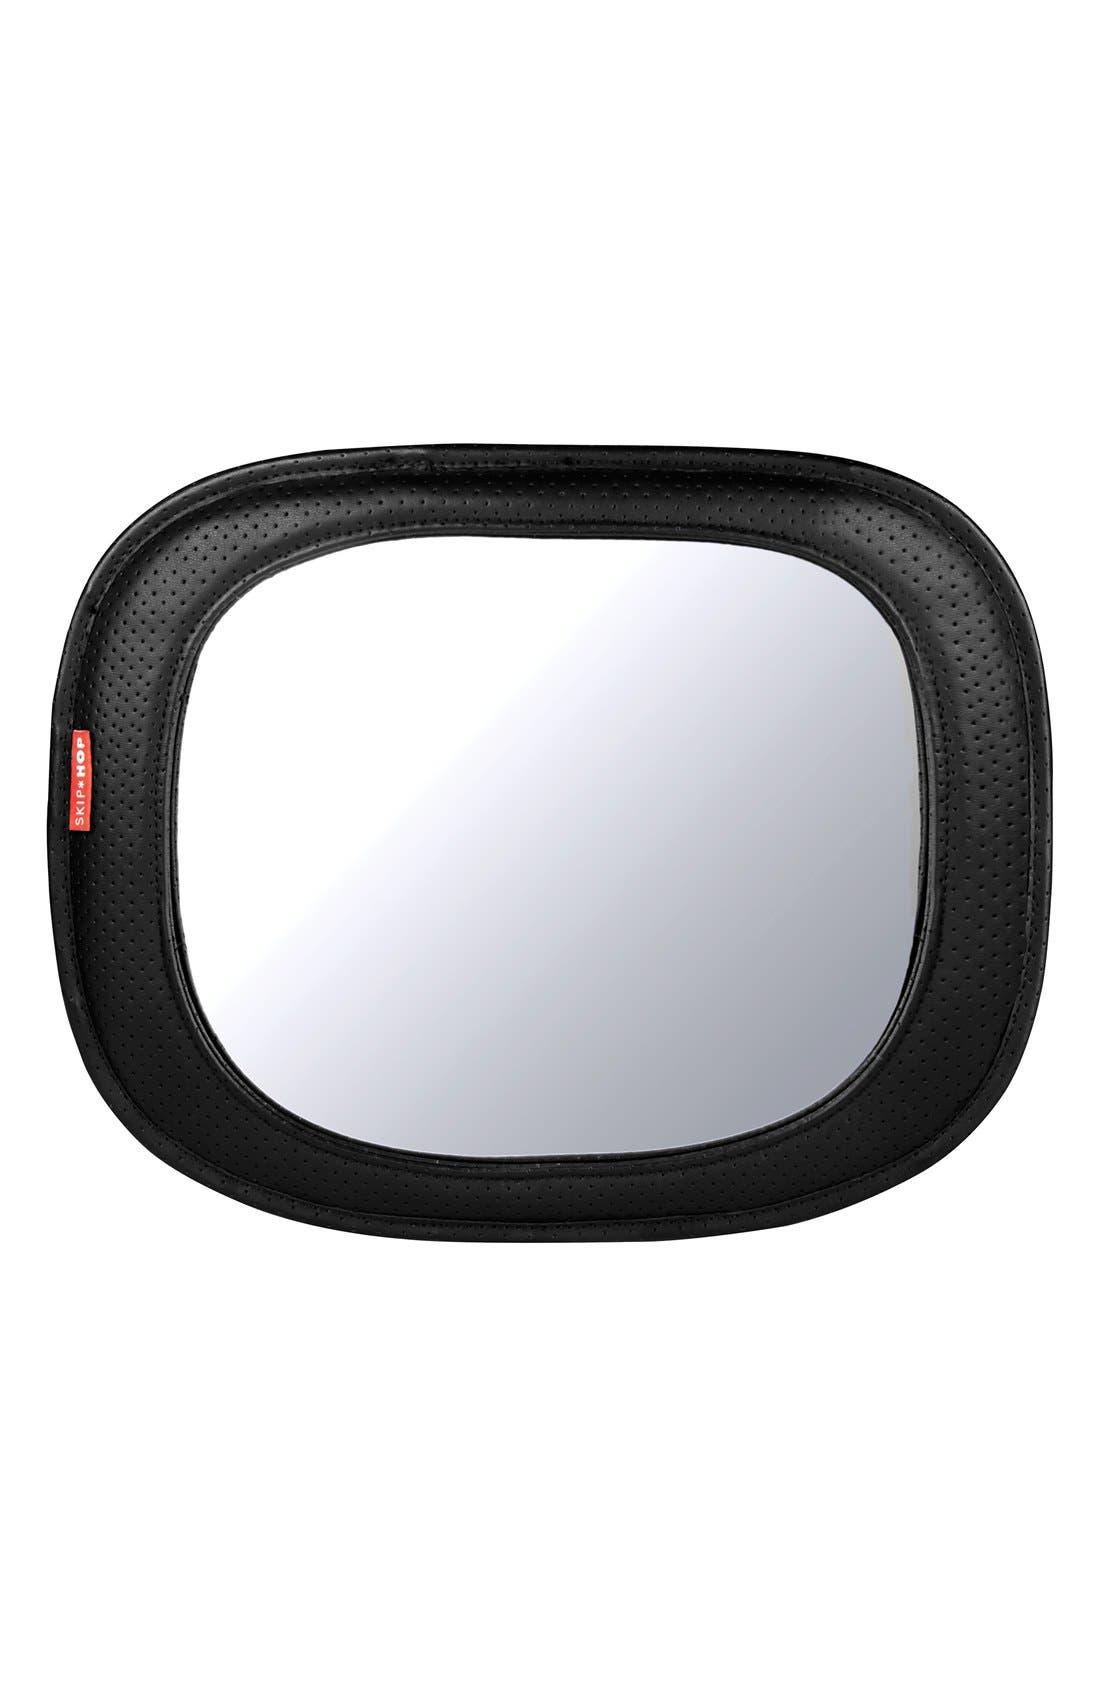 Main Image - Skip Hop Backseat Mirror